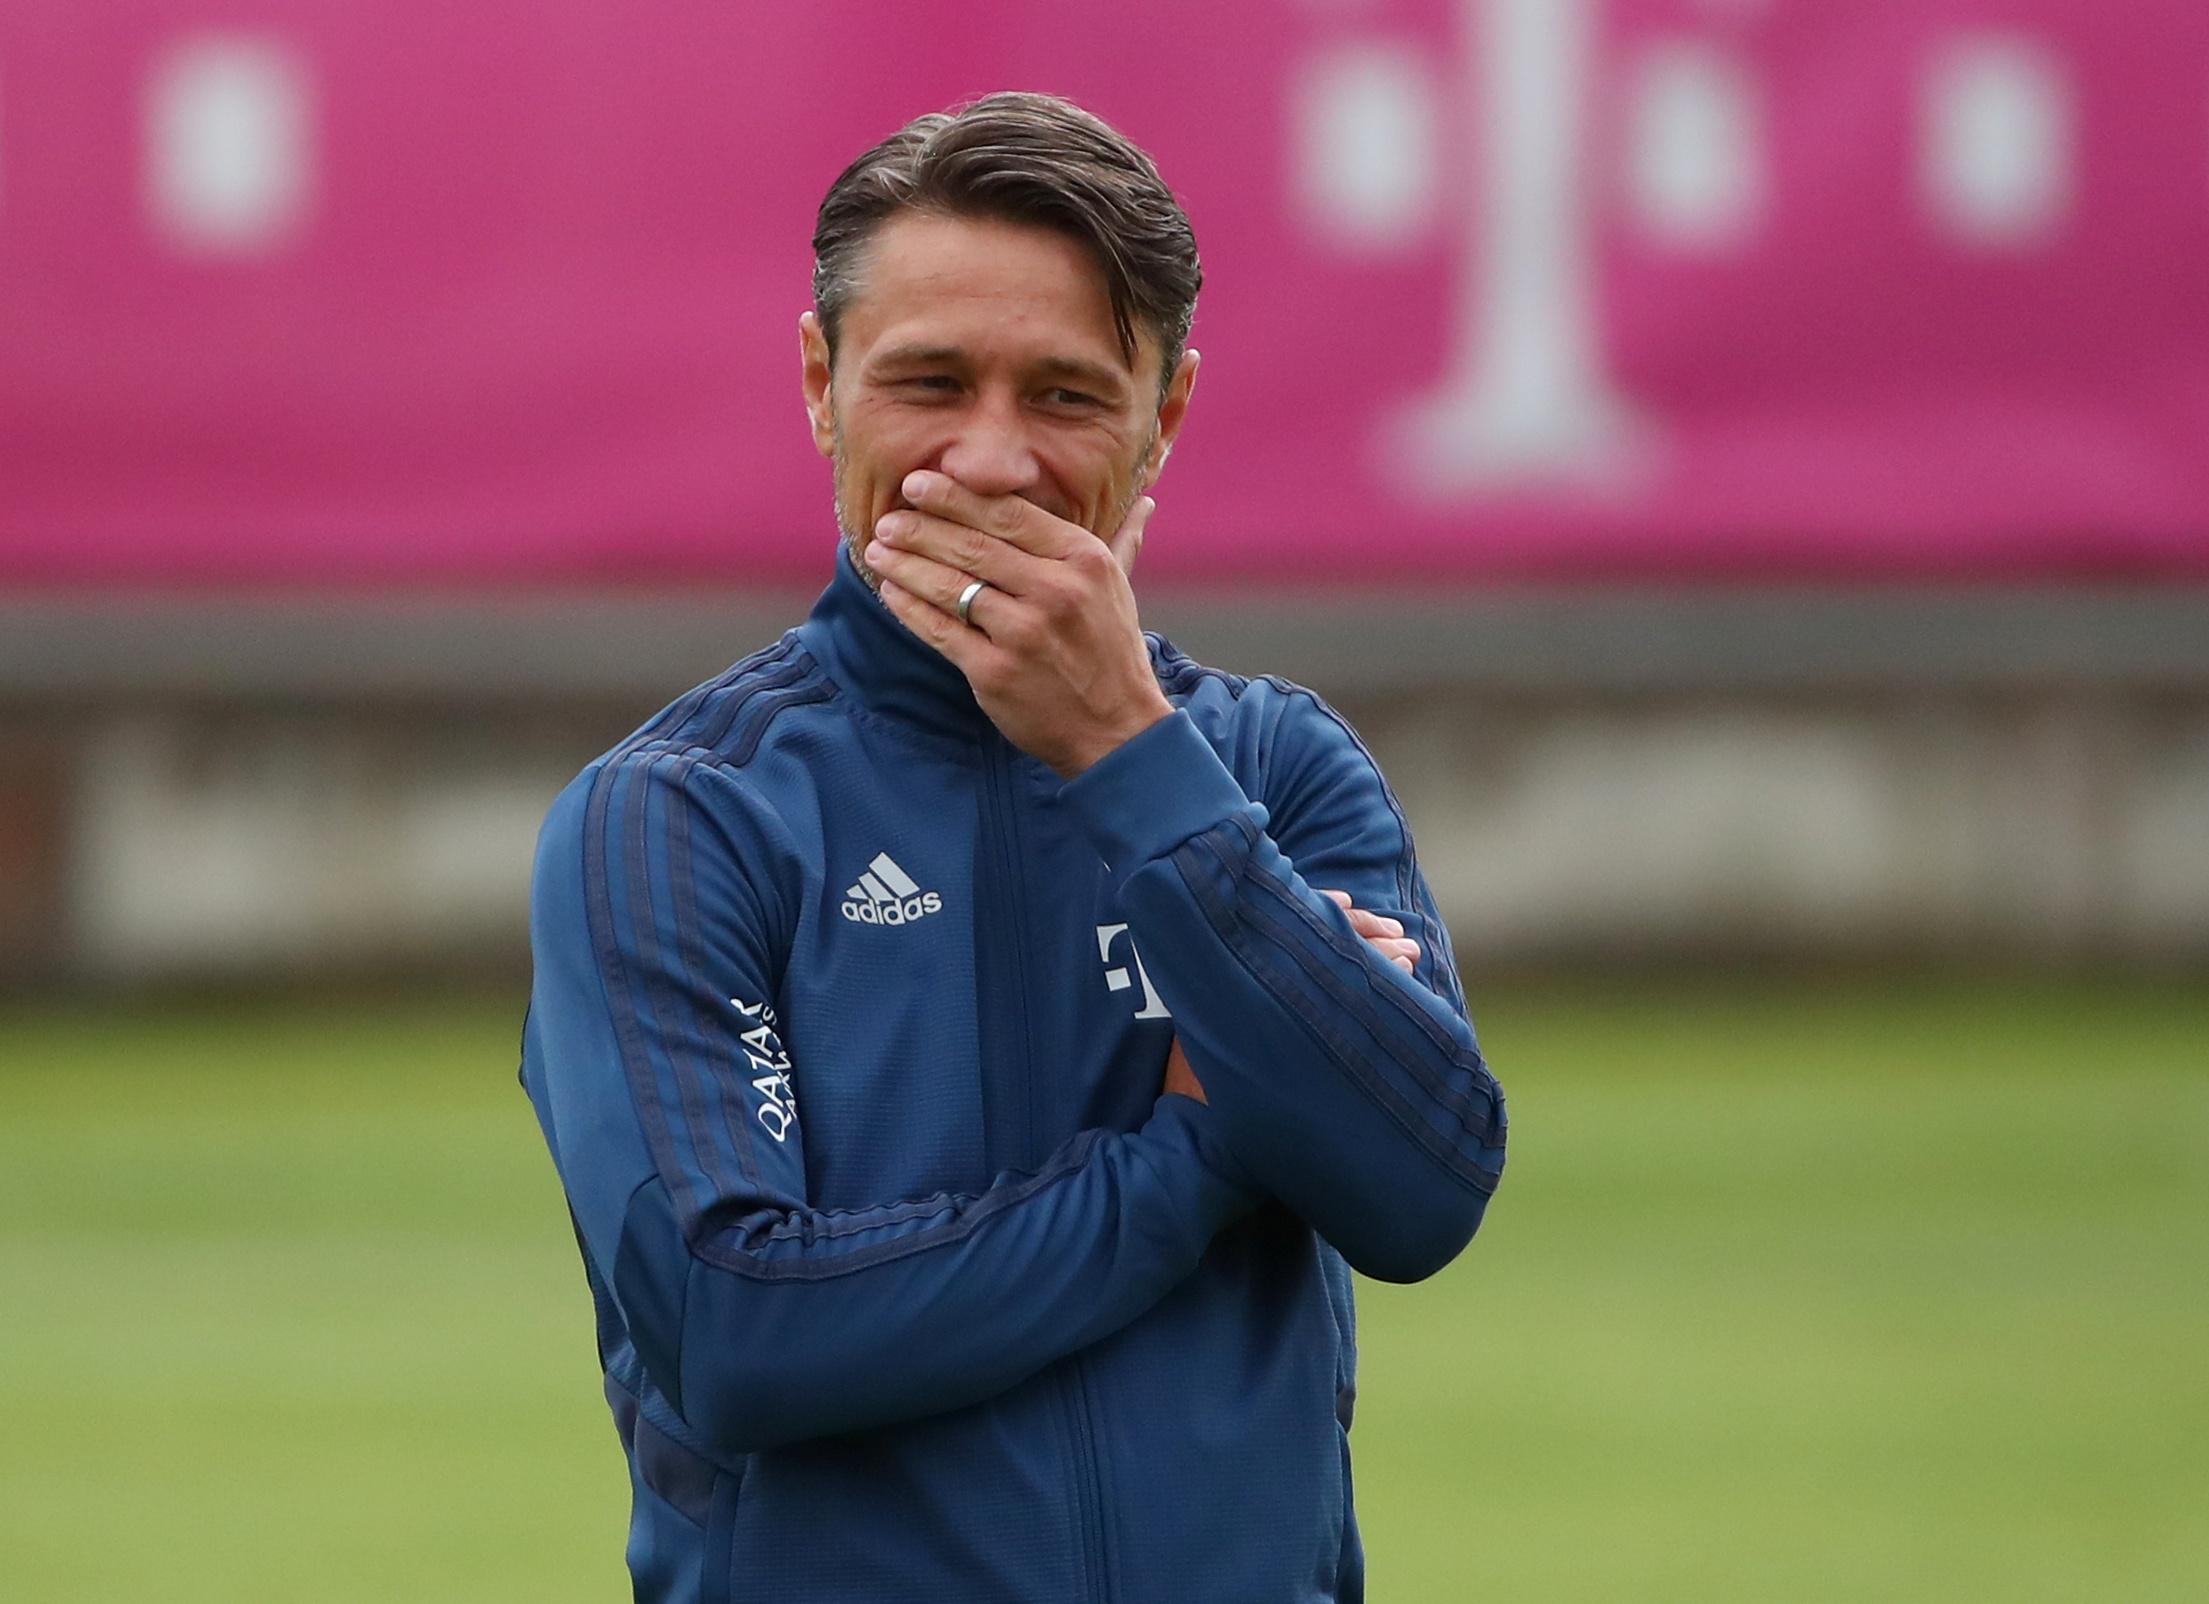 Soccer Football - Bayern Munich Training - Saebener Strasse, Munich, Germany - July 8, 2019   Bayern Munich coach Niko Kovac during training   REUTERS/Michael Dalder - RC1A95CF6D20